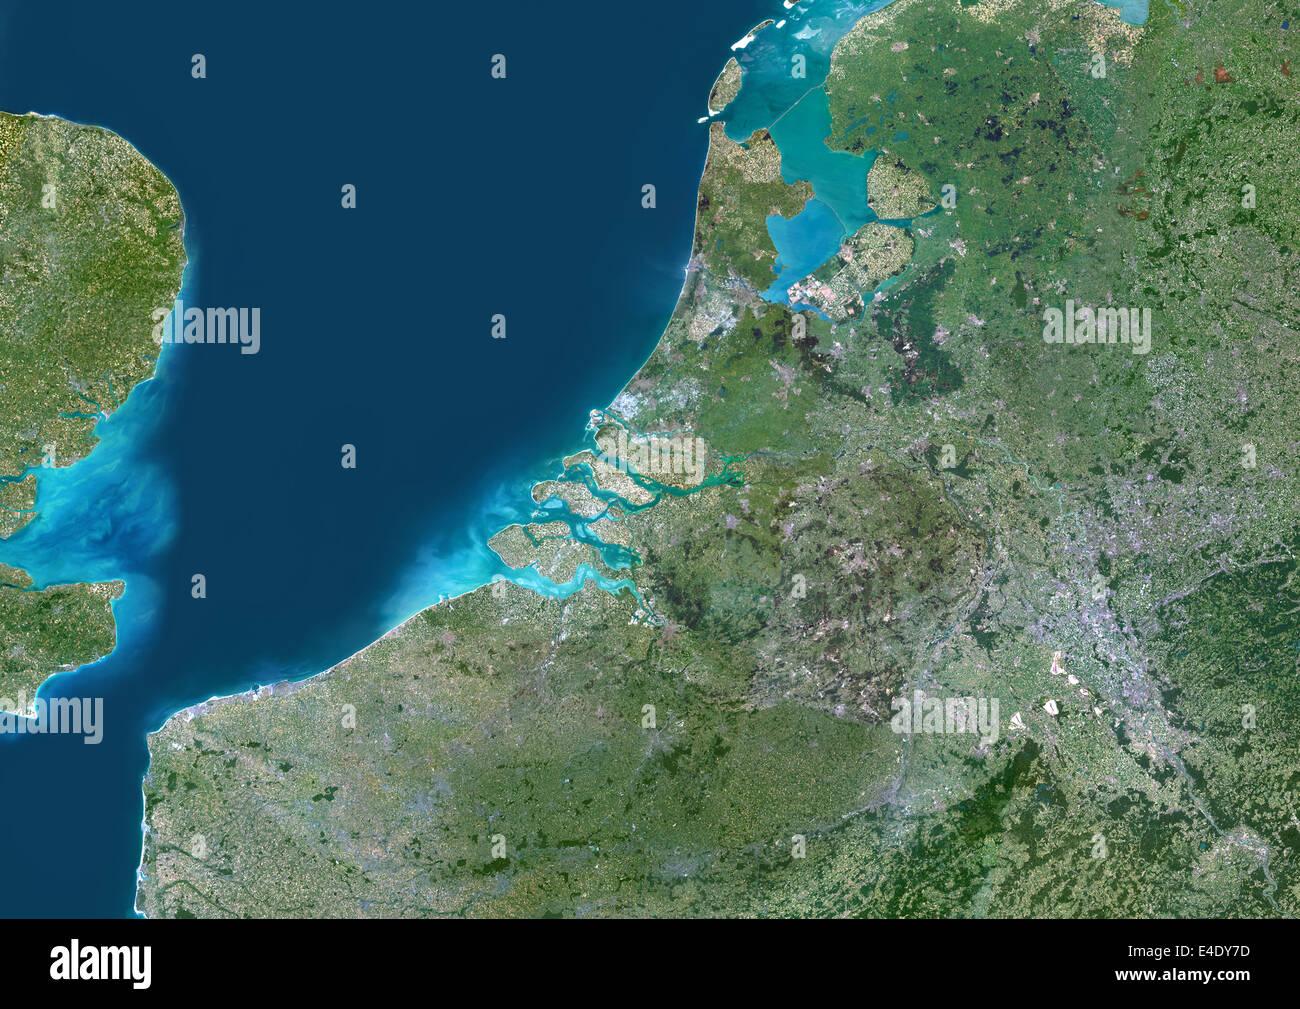 Rhine, Meuse And Scheldt Delta, Netherlands, True Colour Satellite Image. True colour satellite image of the Rhine - Stock Image